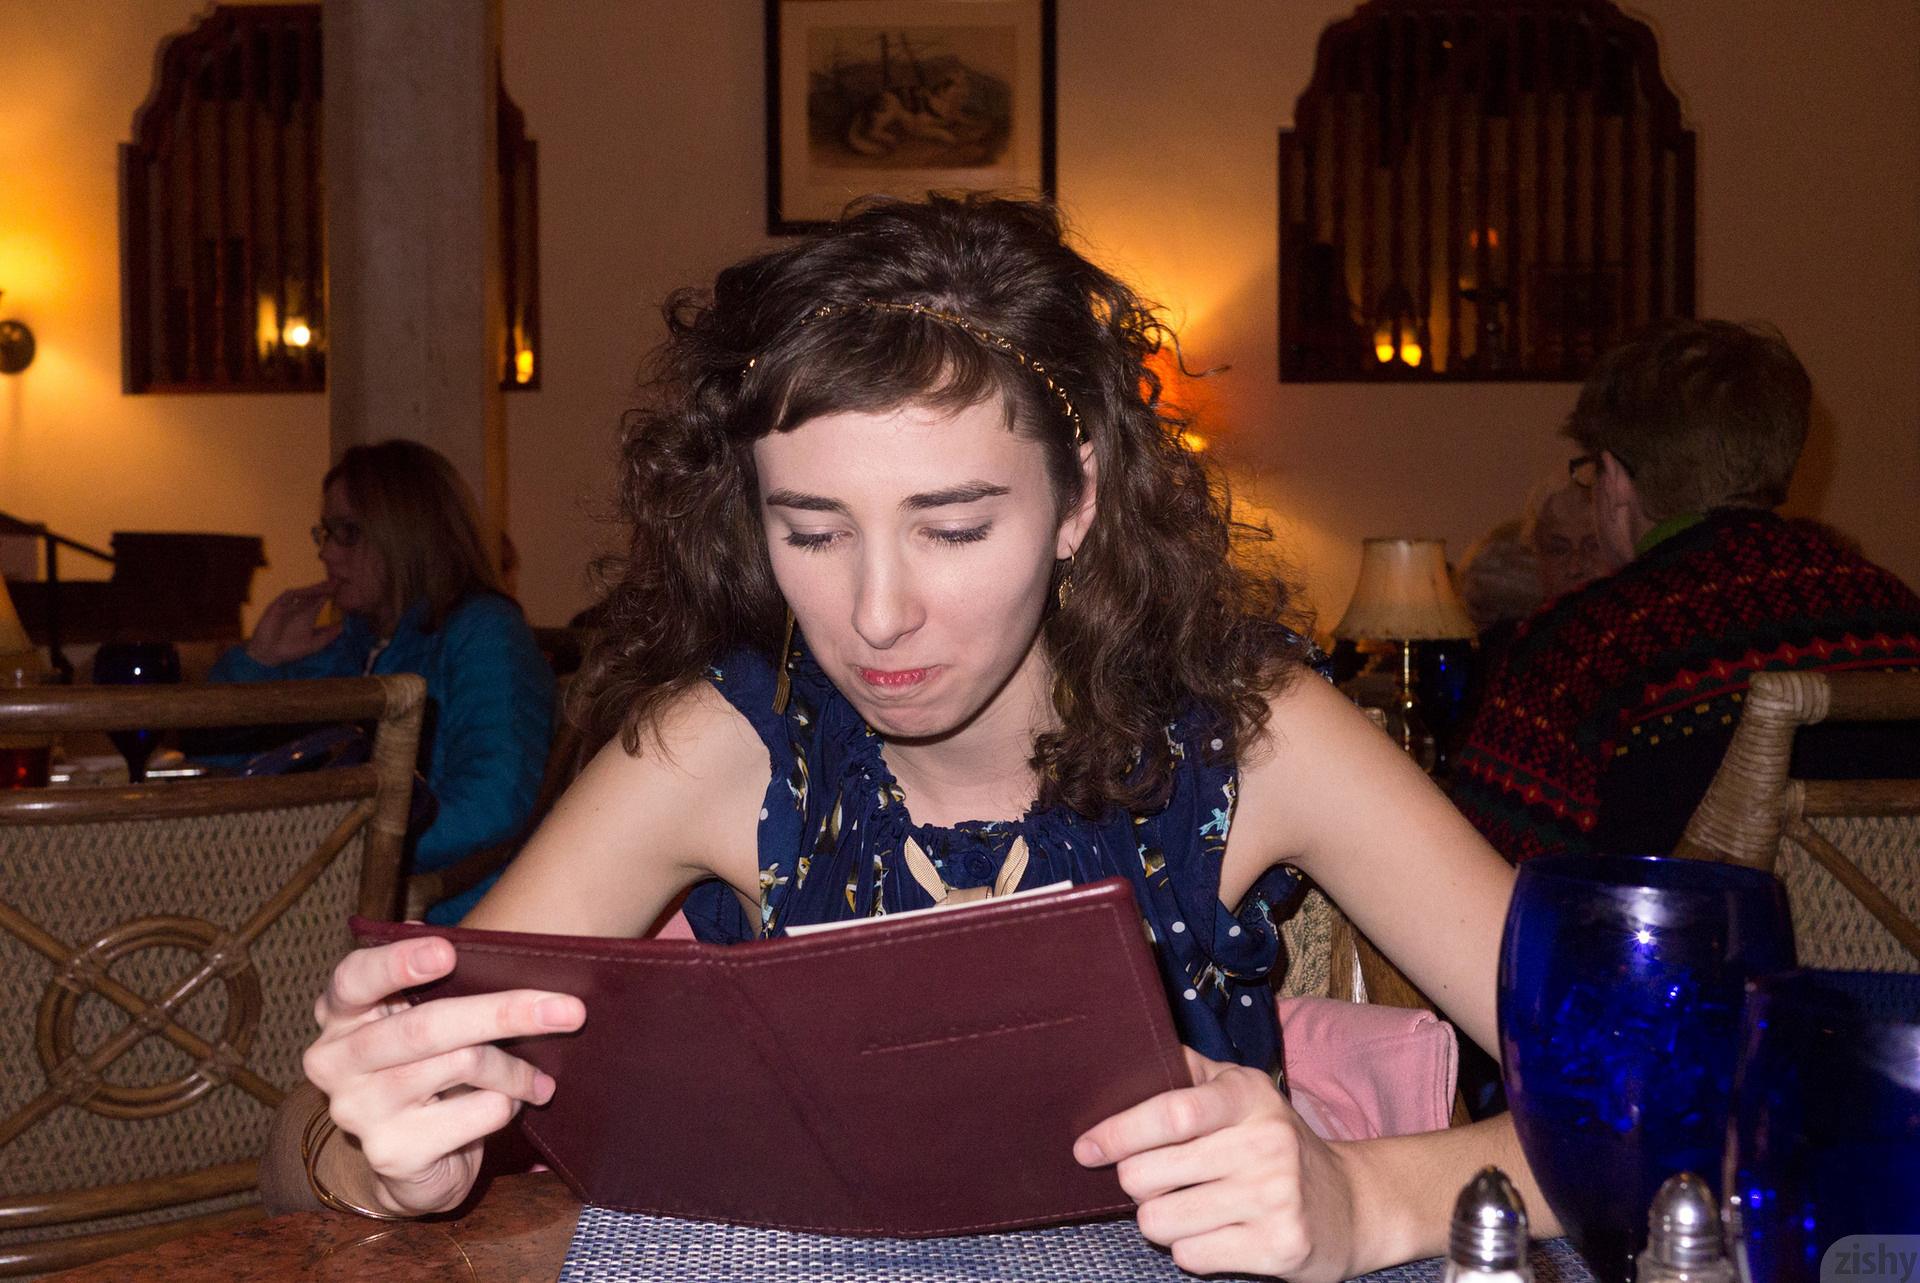 Yvette Nolot At Arizona Inn Zishy (9)